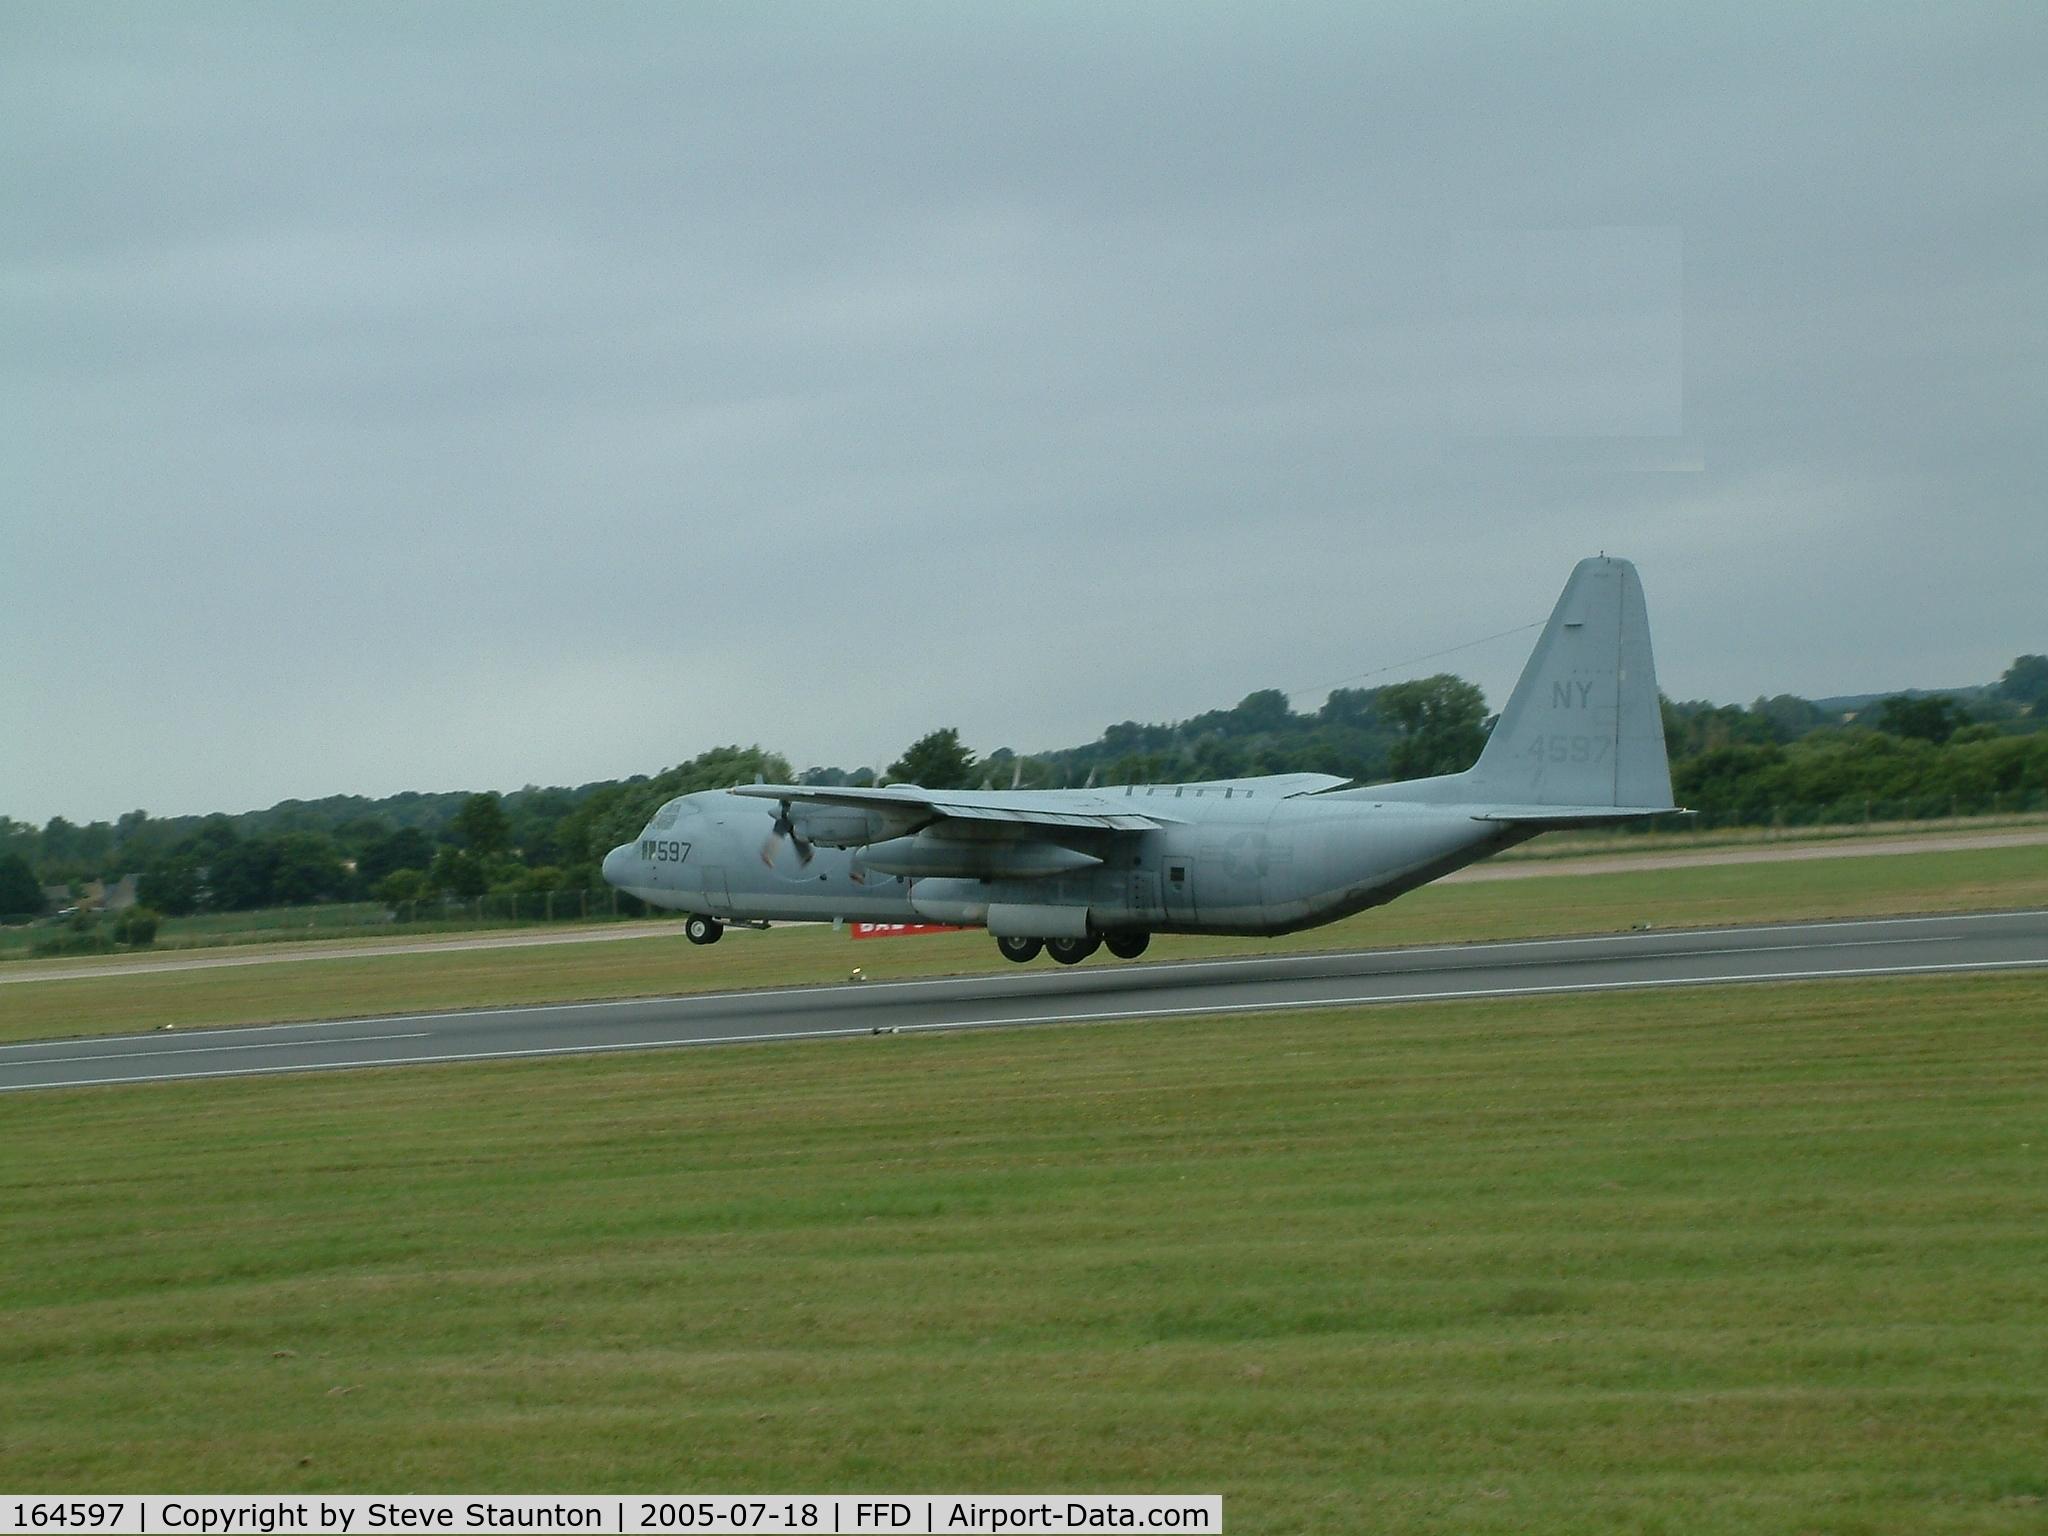 164597, Lockheed KC-130T-30 Hercules C/N 382-5260, Royal International Air Tattoo 2005